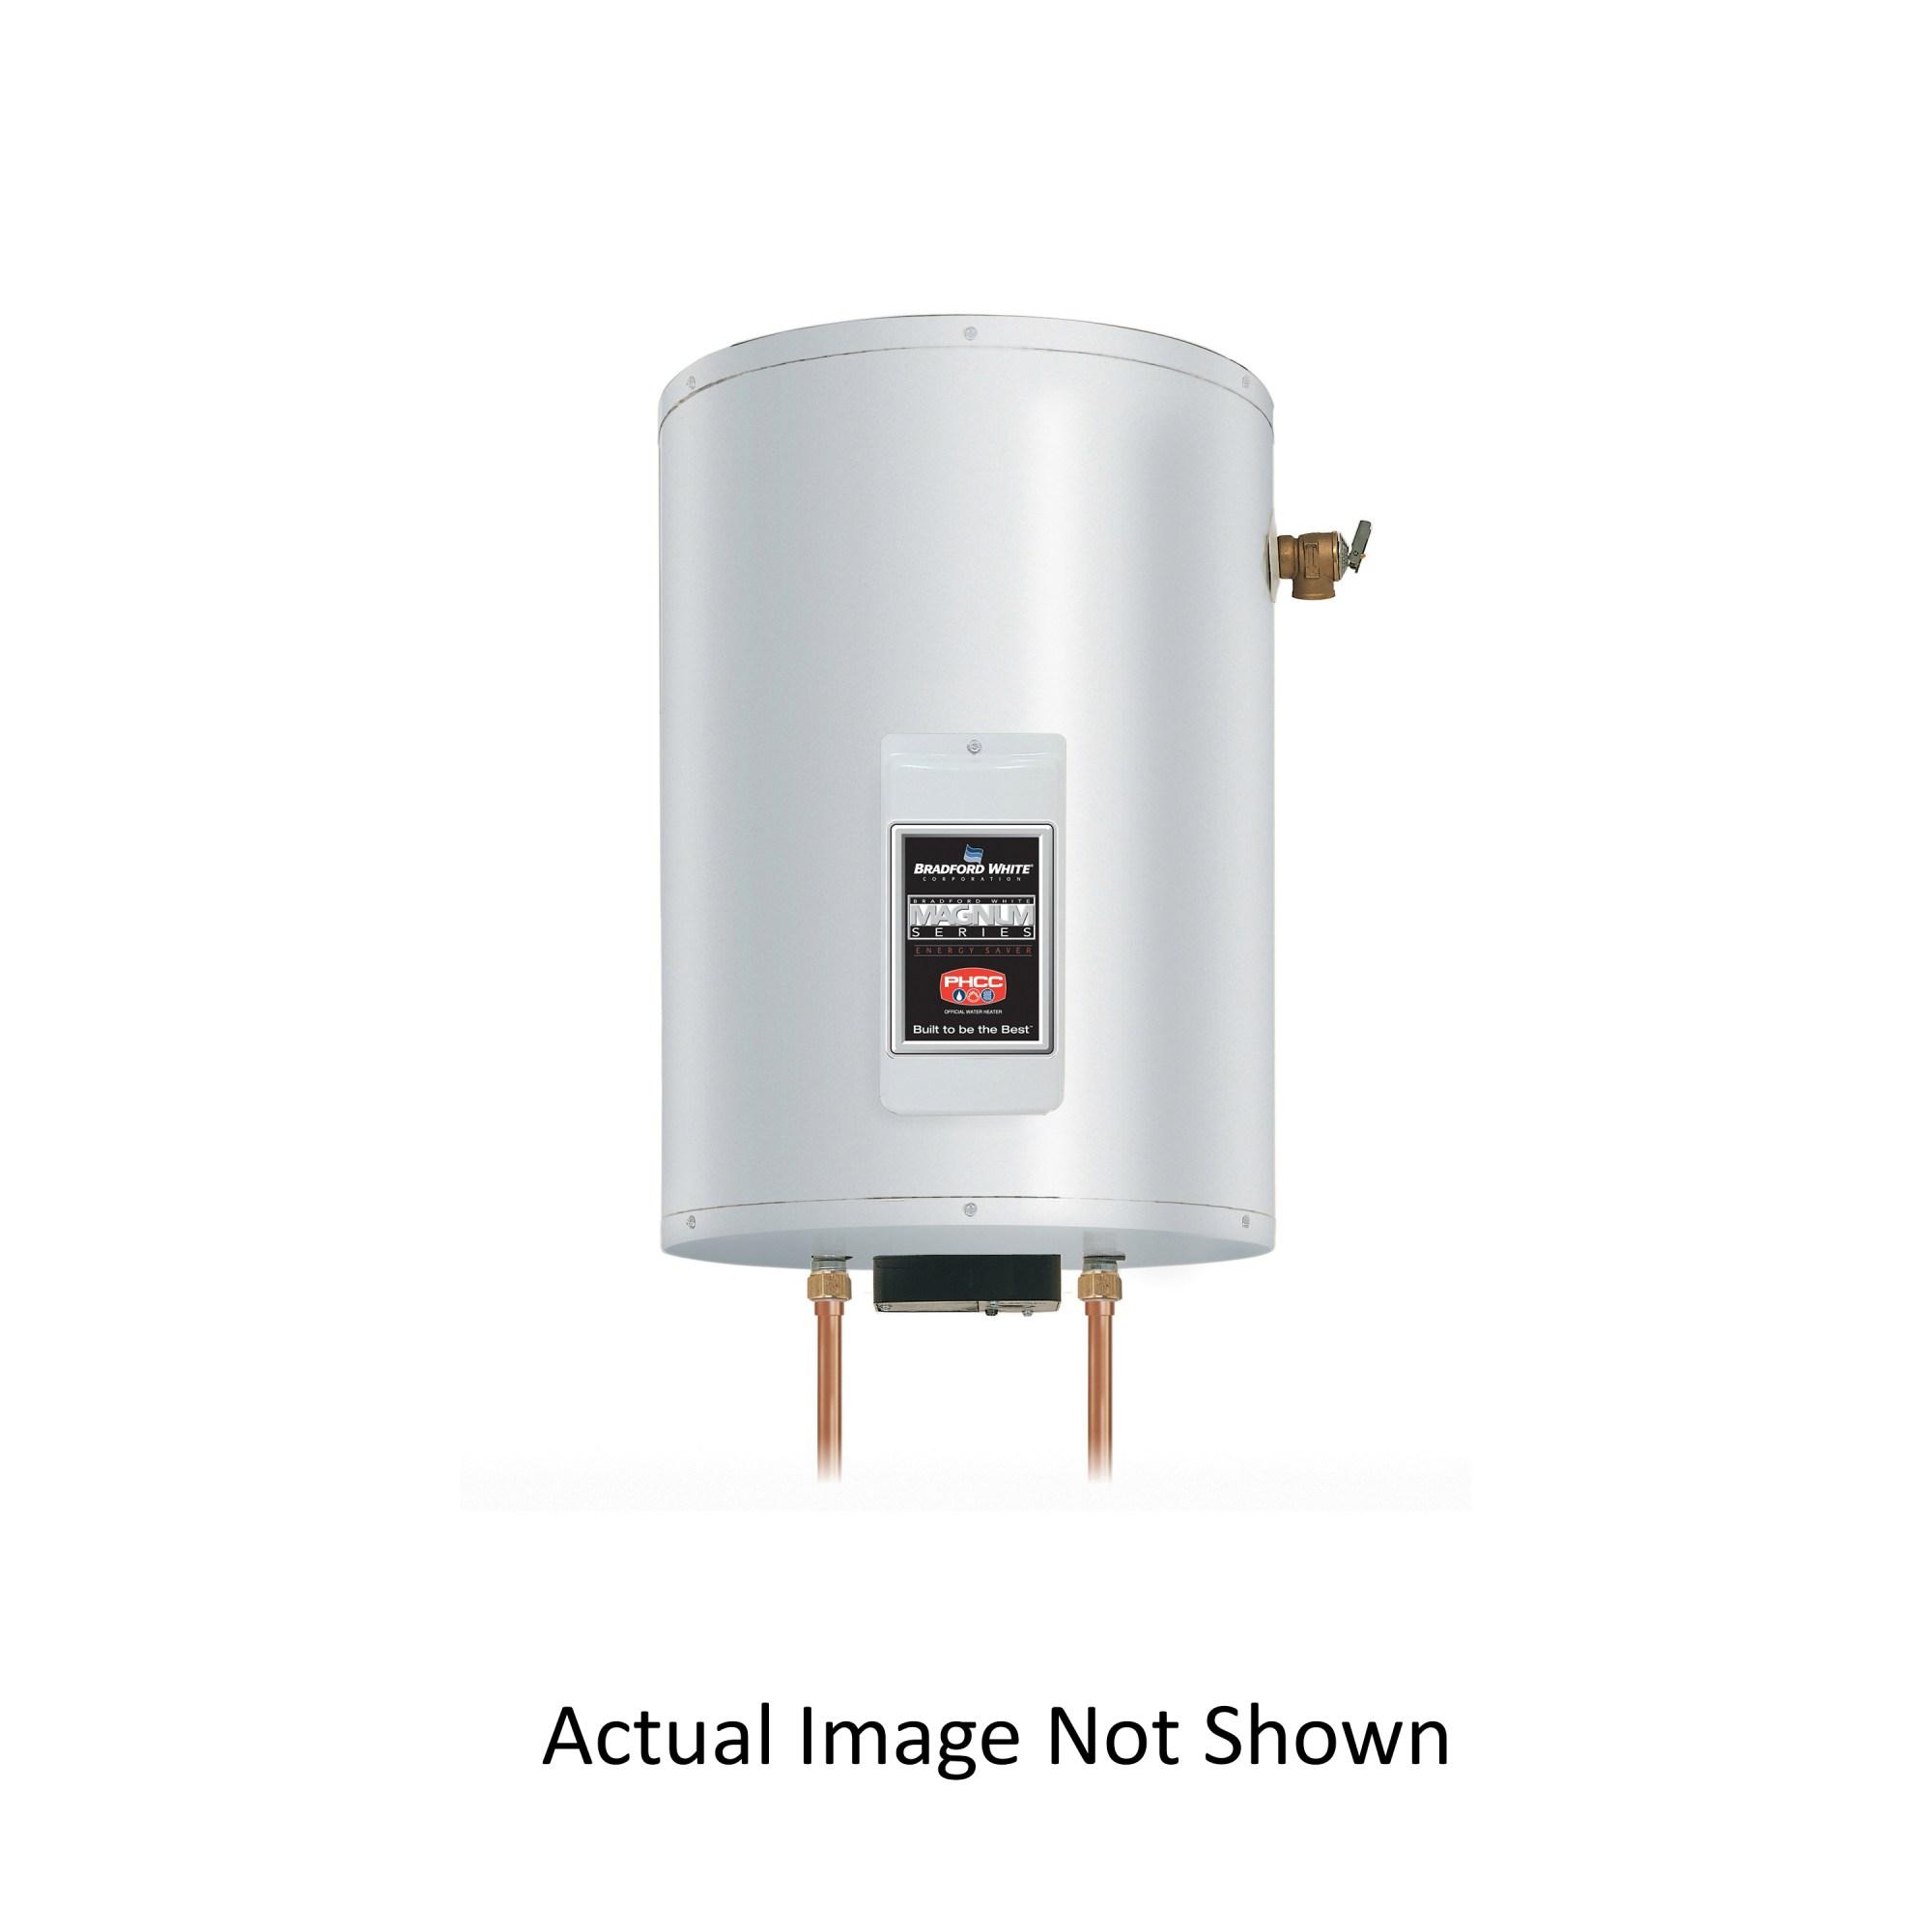 hight resolution of bradford white electriflex ld le120wv3 1ncz light duty wall hung electric water heater 19 gal tank 4500 w at 208 vac 6000 w at 240 vac 208 240 vac